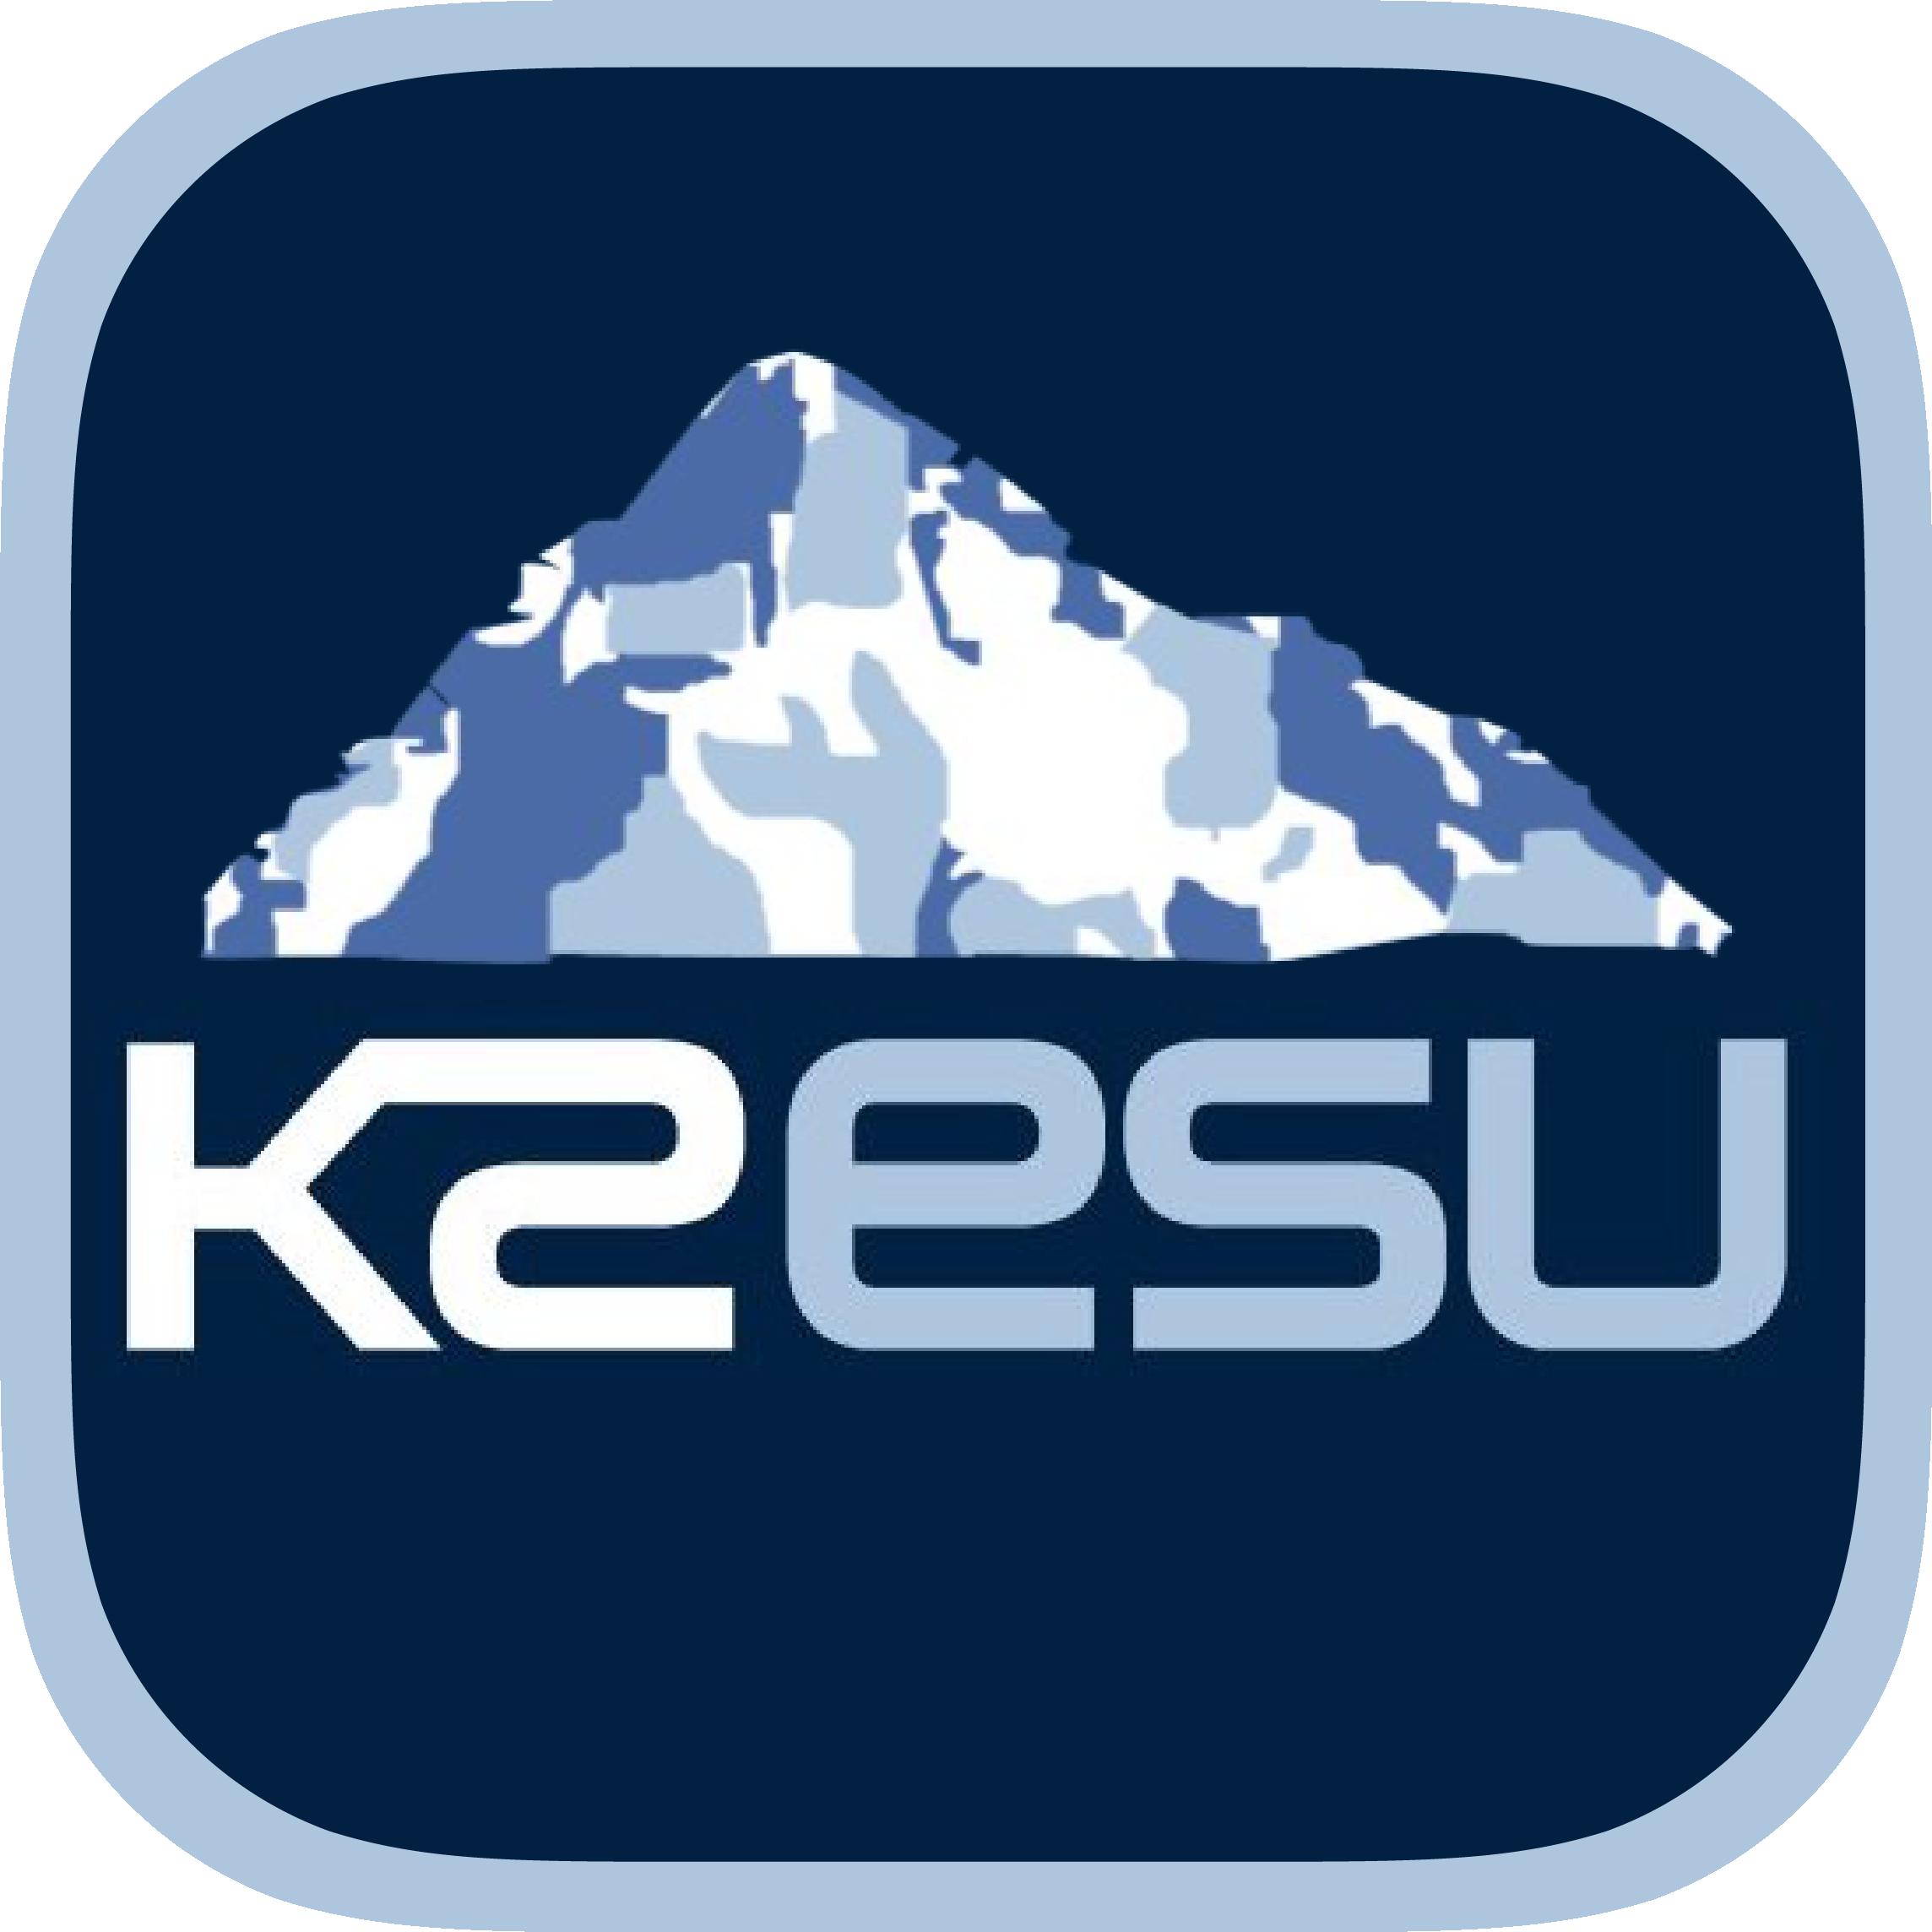 K2 ESU